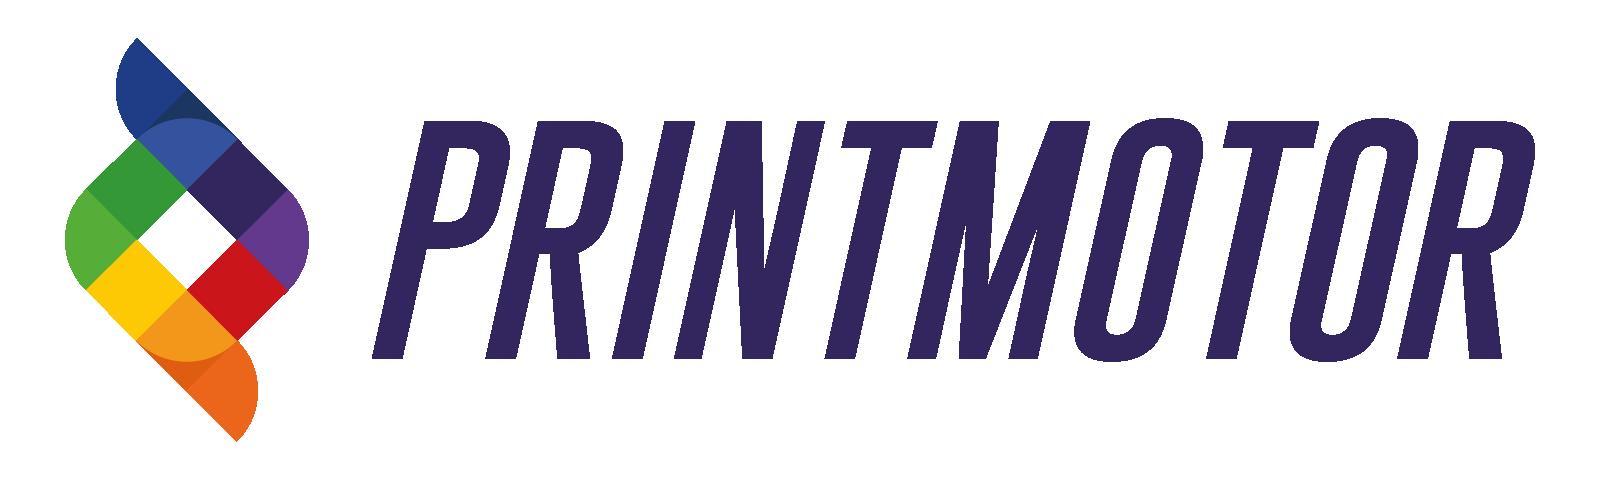 printmotor_logo.png